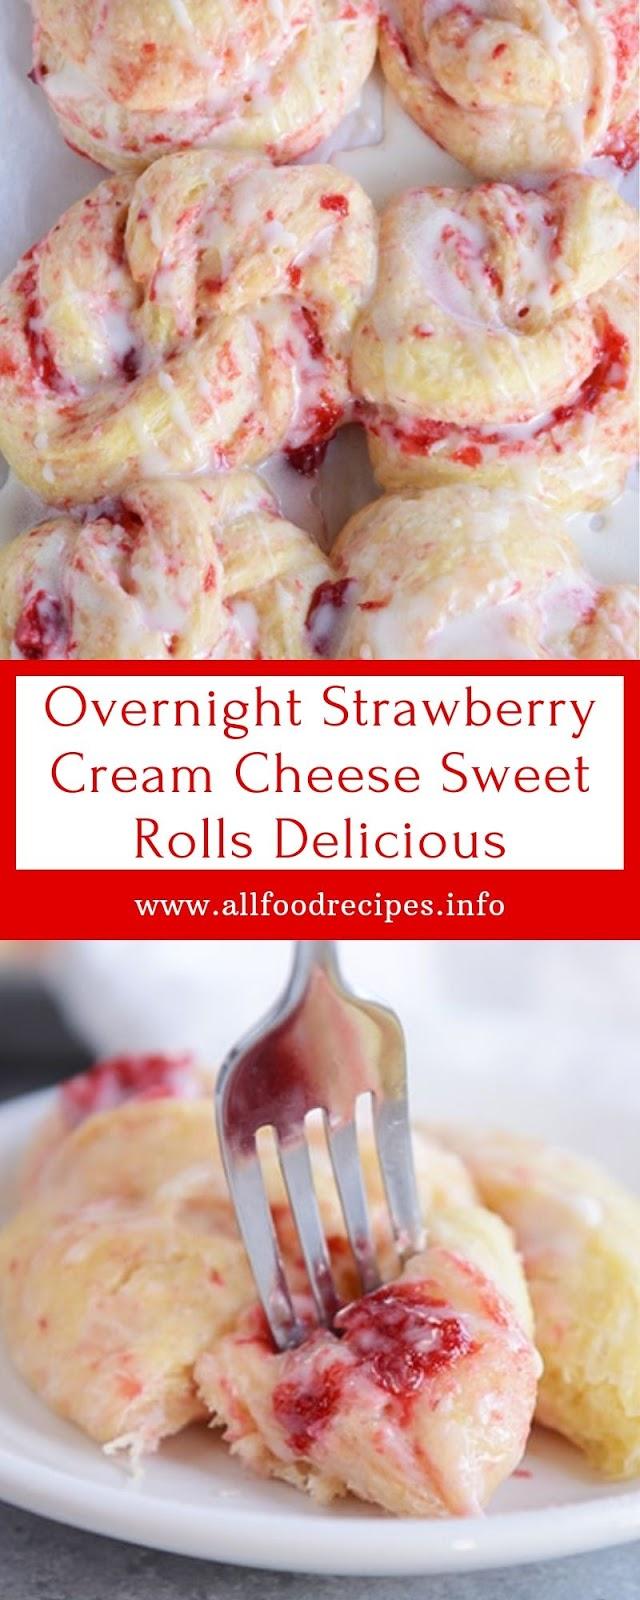 Overnight Strawberry Cream Cheese Sweet Rolls Delicious